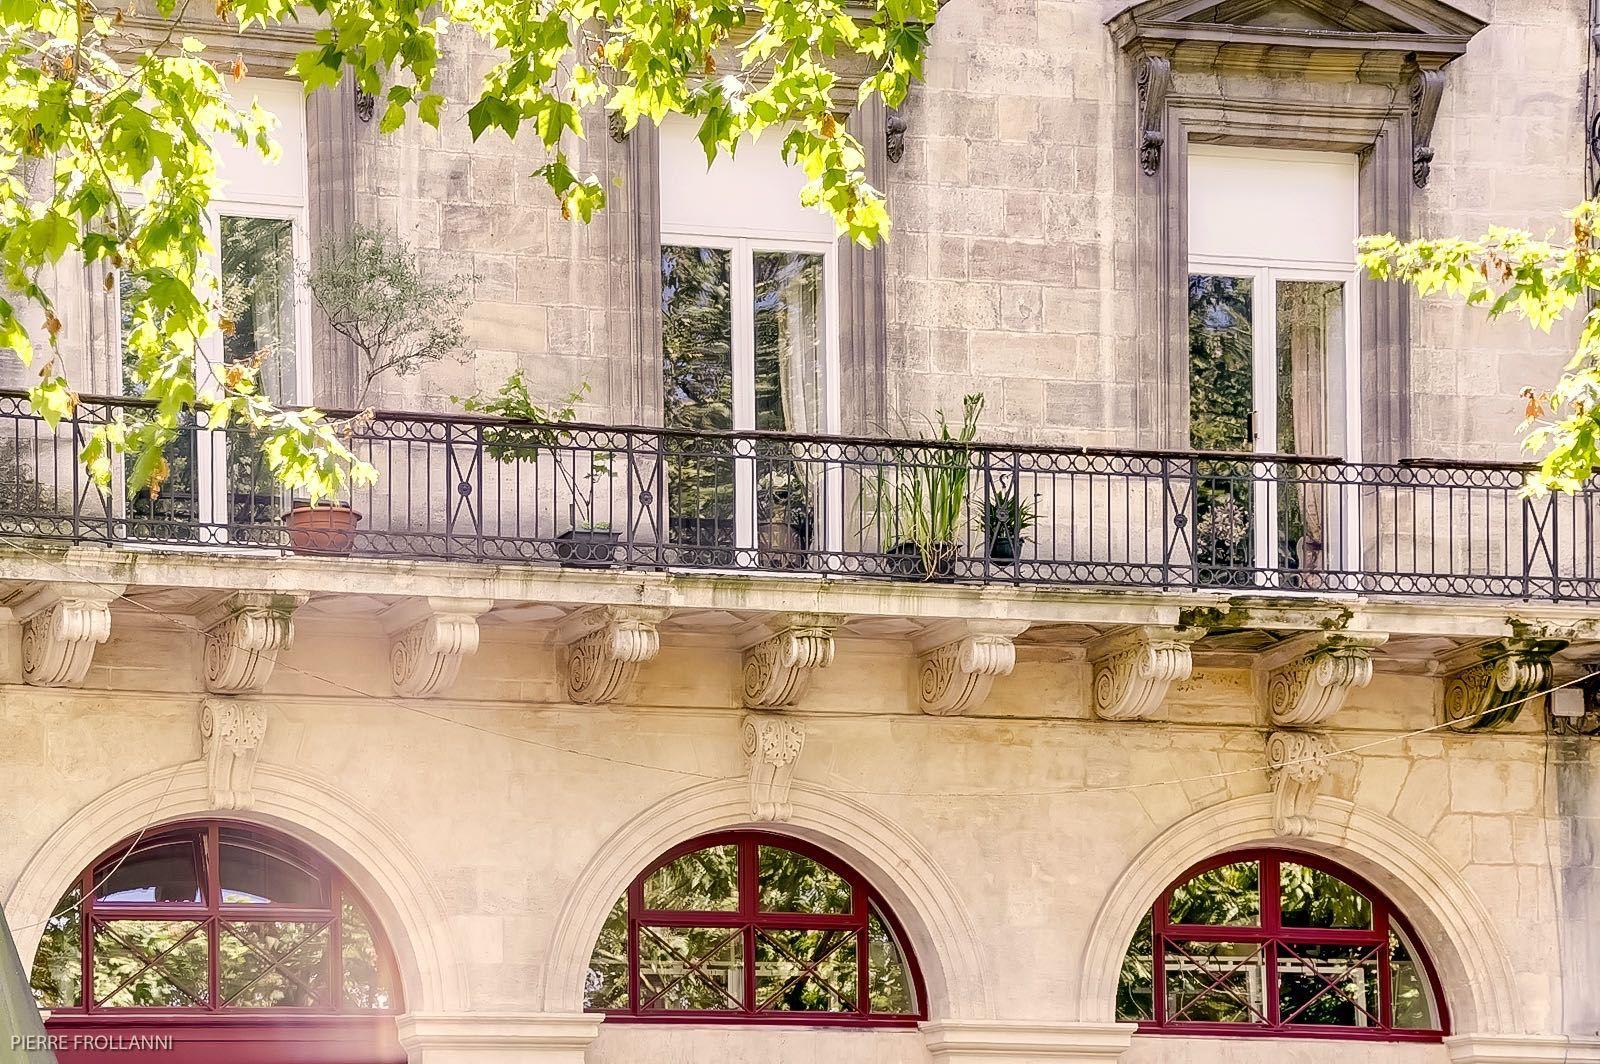 Wohnung für Verkauf beim BORDEAUX - GOLDEN TRIANGLE - UNIQUE 185,25 m² APARTMENT Bordeaux, Aquitanien, 33000 Frankreich